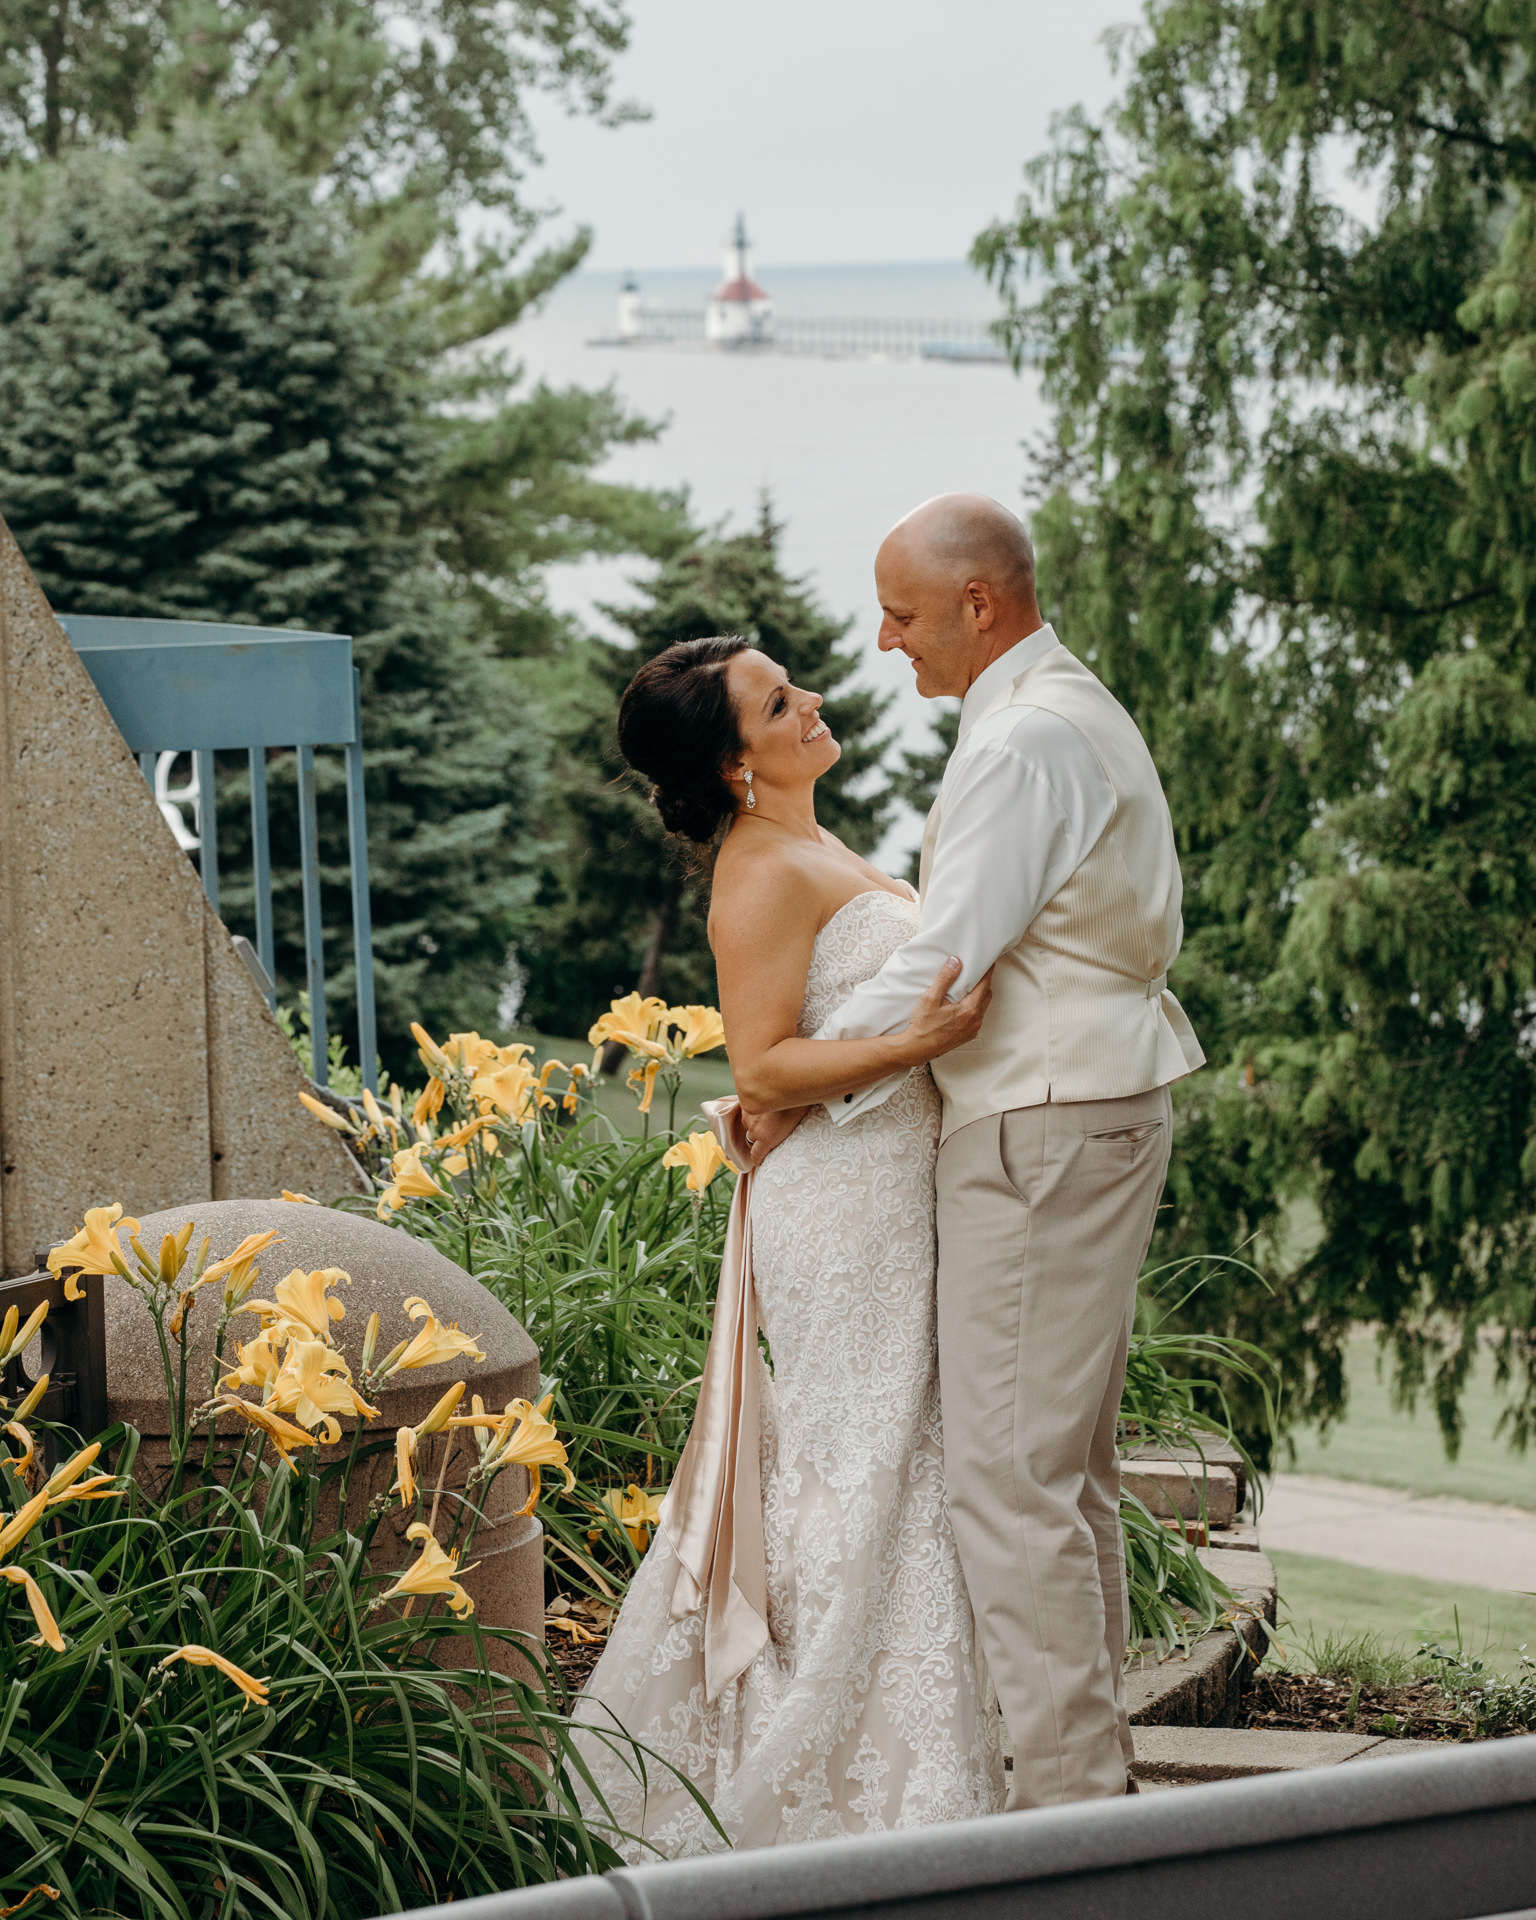 Grant Beachy Tammy Chris wedding photography goshen Saint Joseph veranda whitcomb-081.jpg